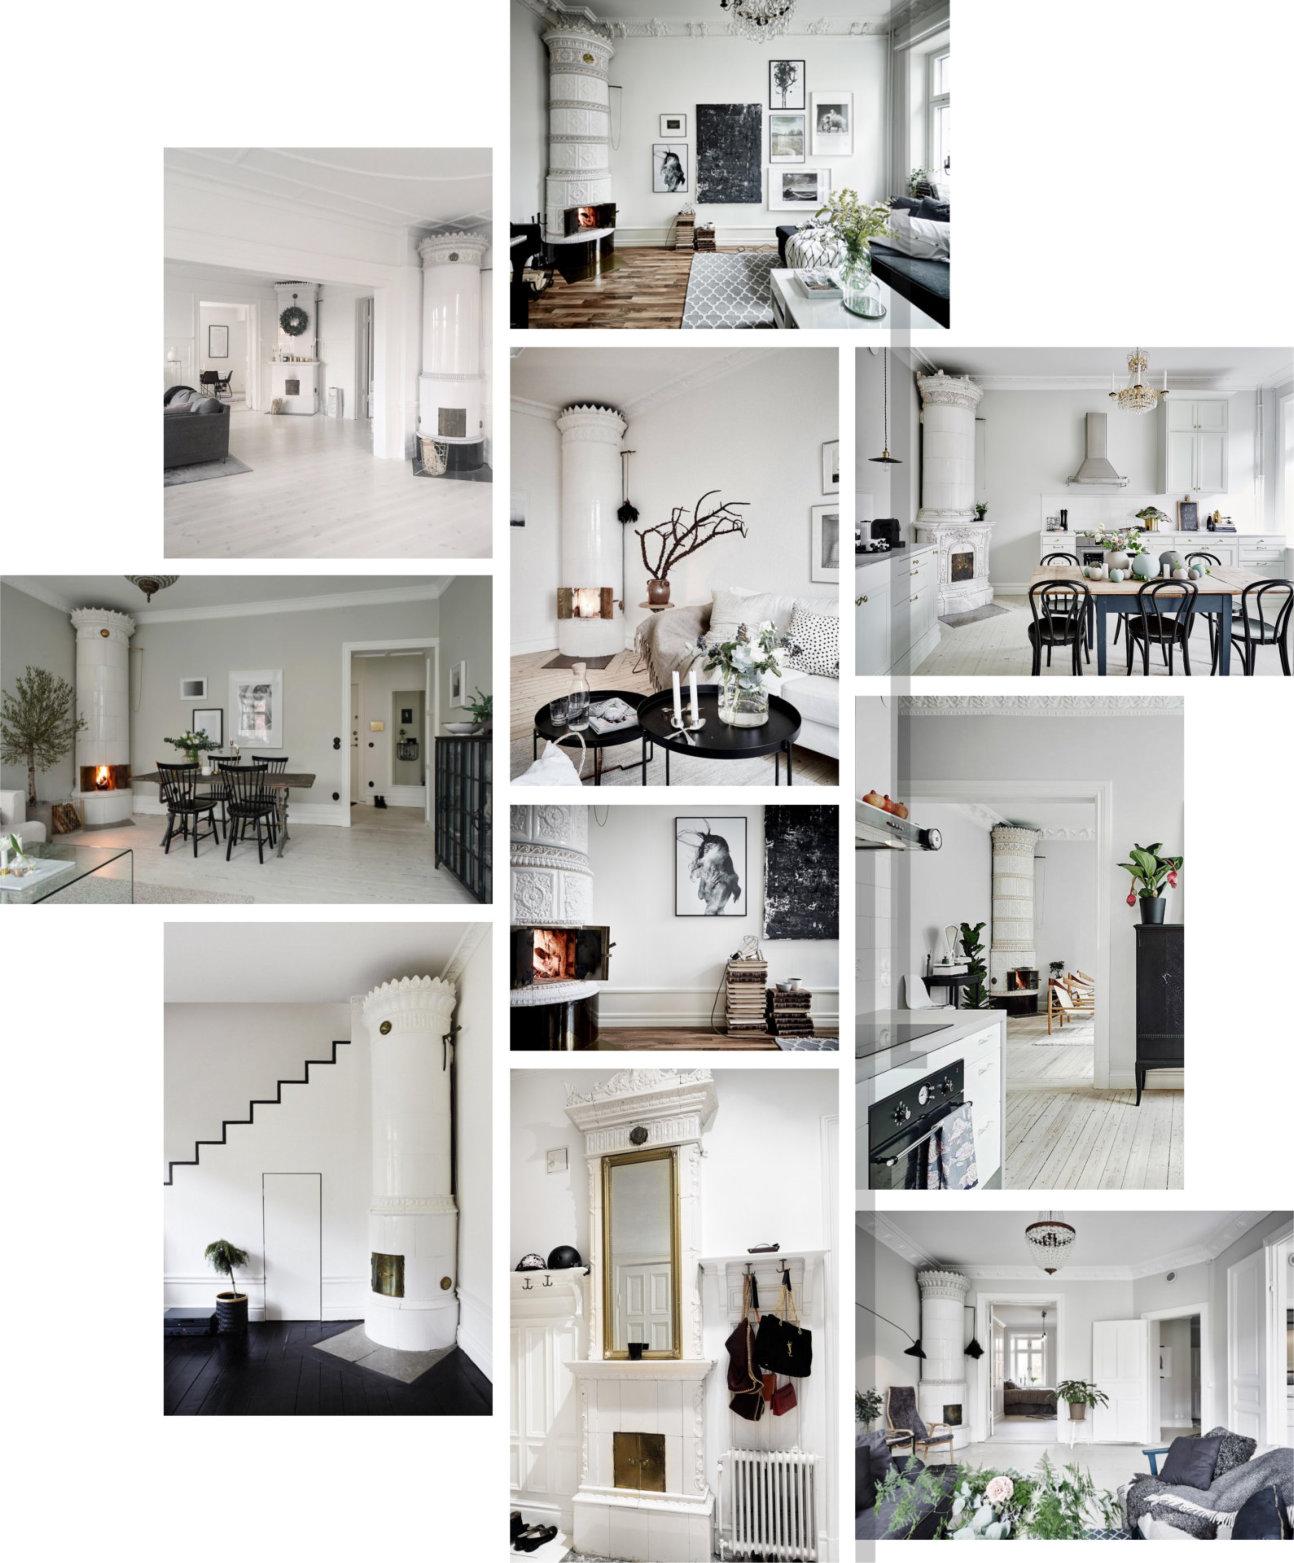 interiorlines_homestyling_sved_apartman0k.jpg